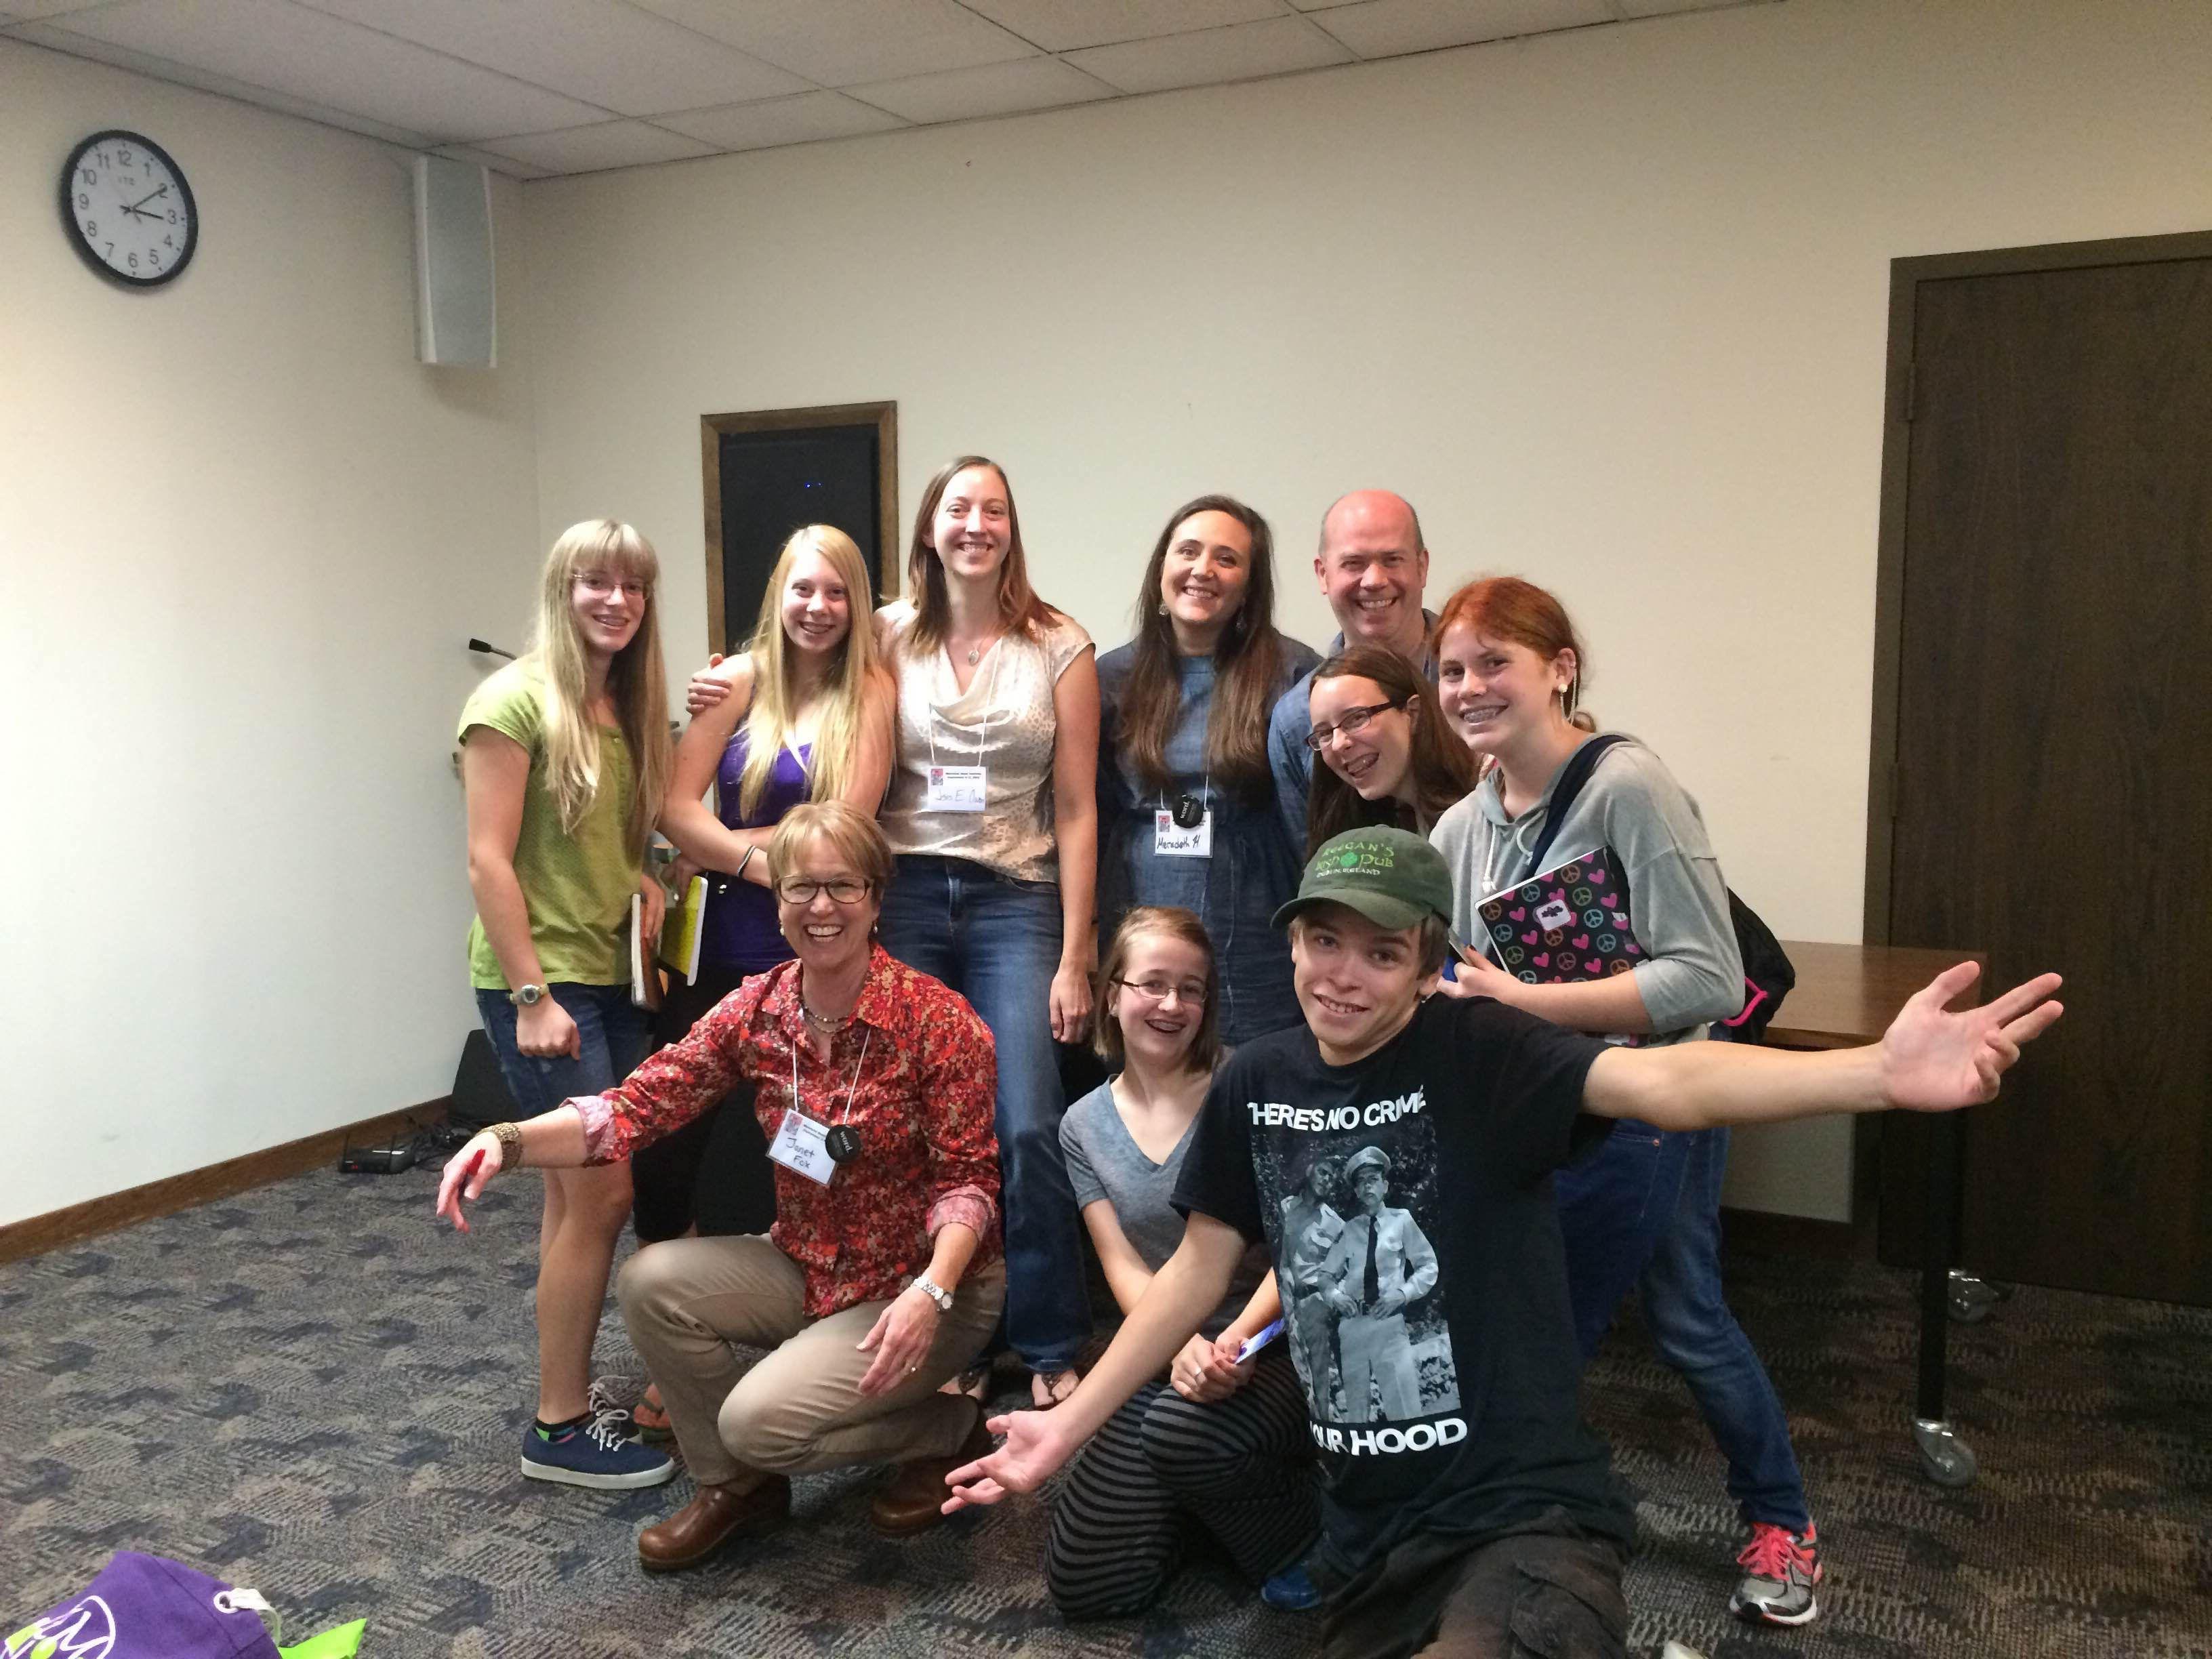 At 2015 Montana Book Festival!